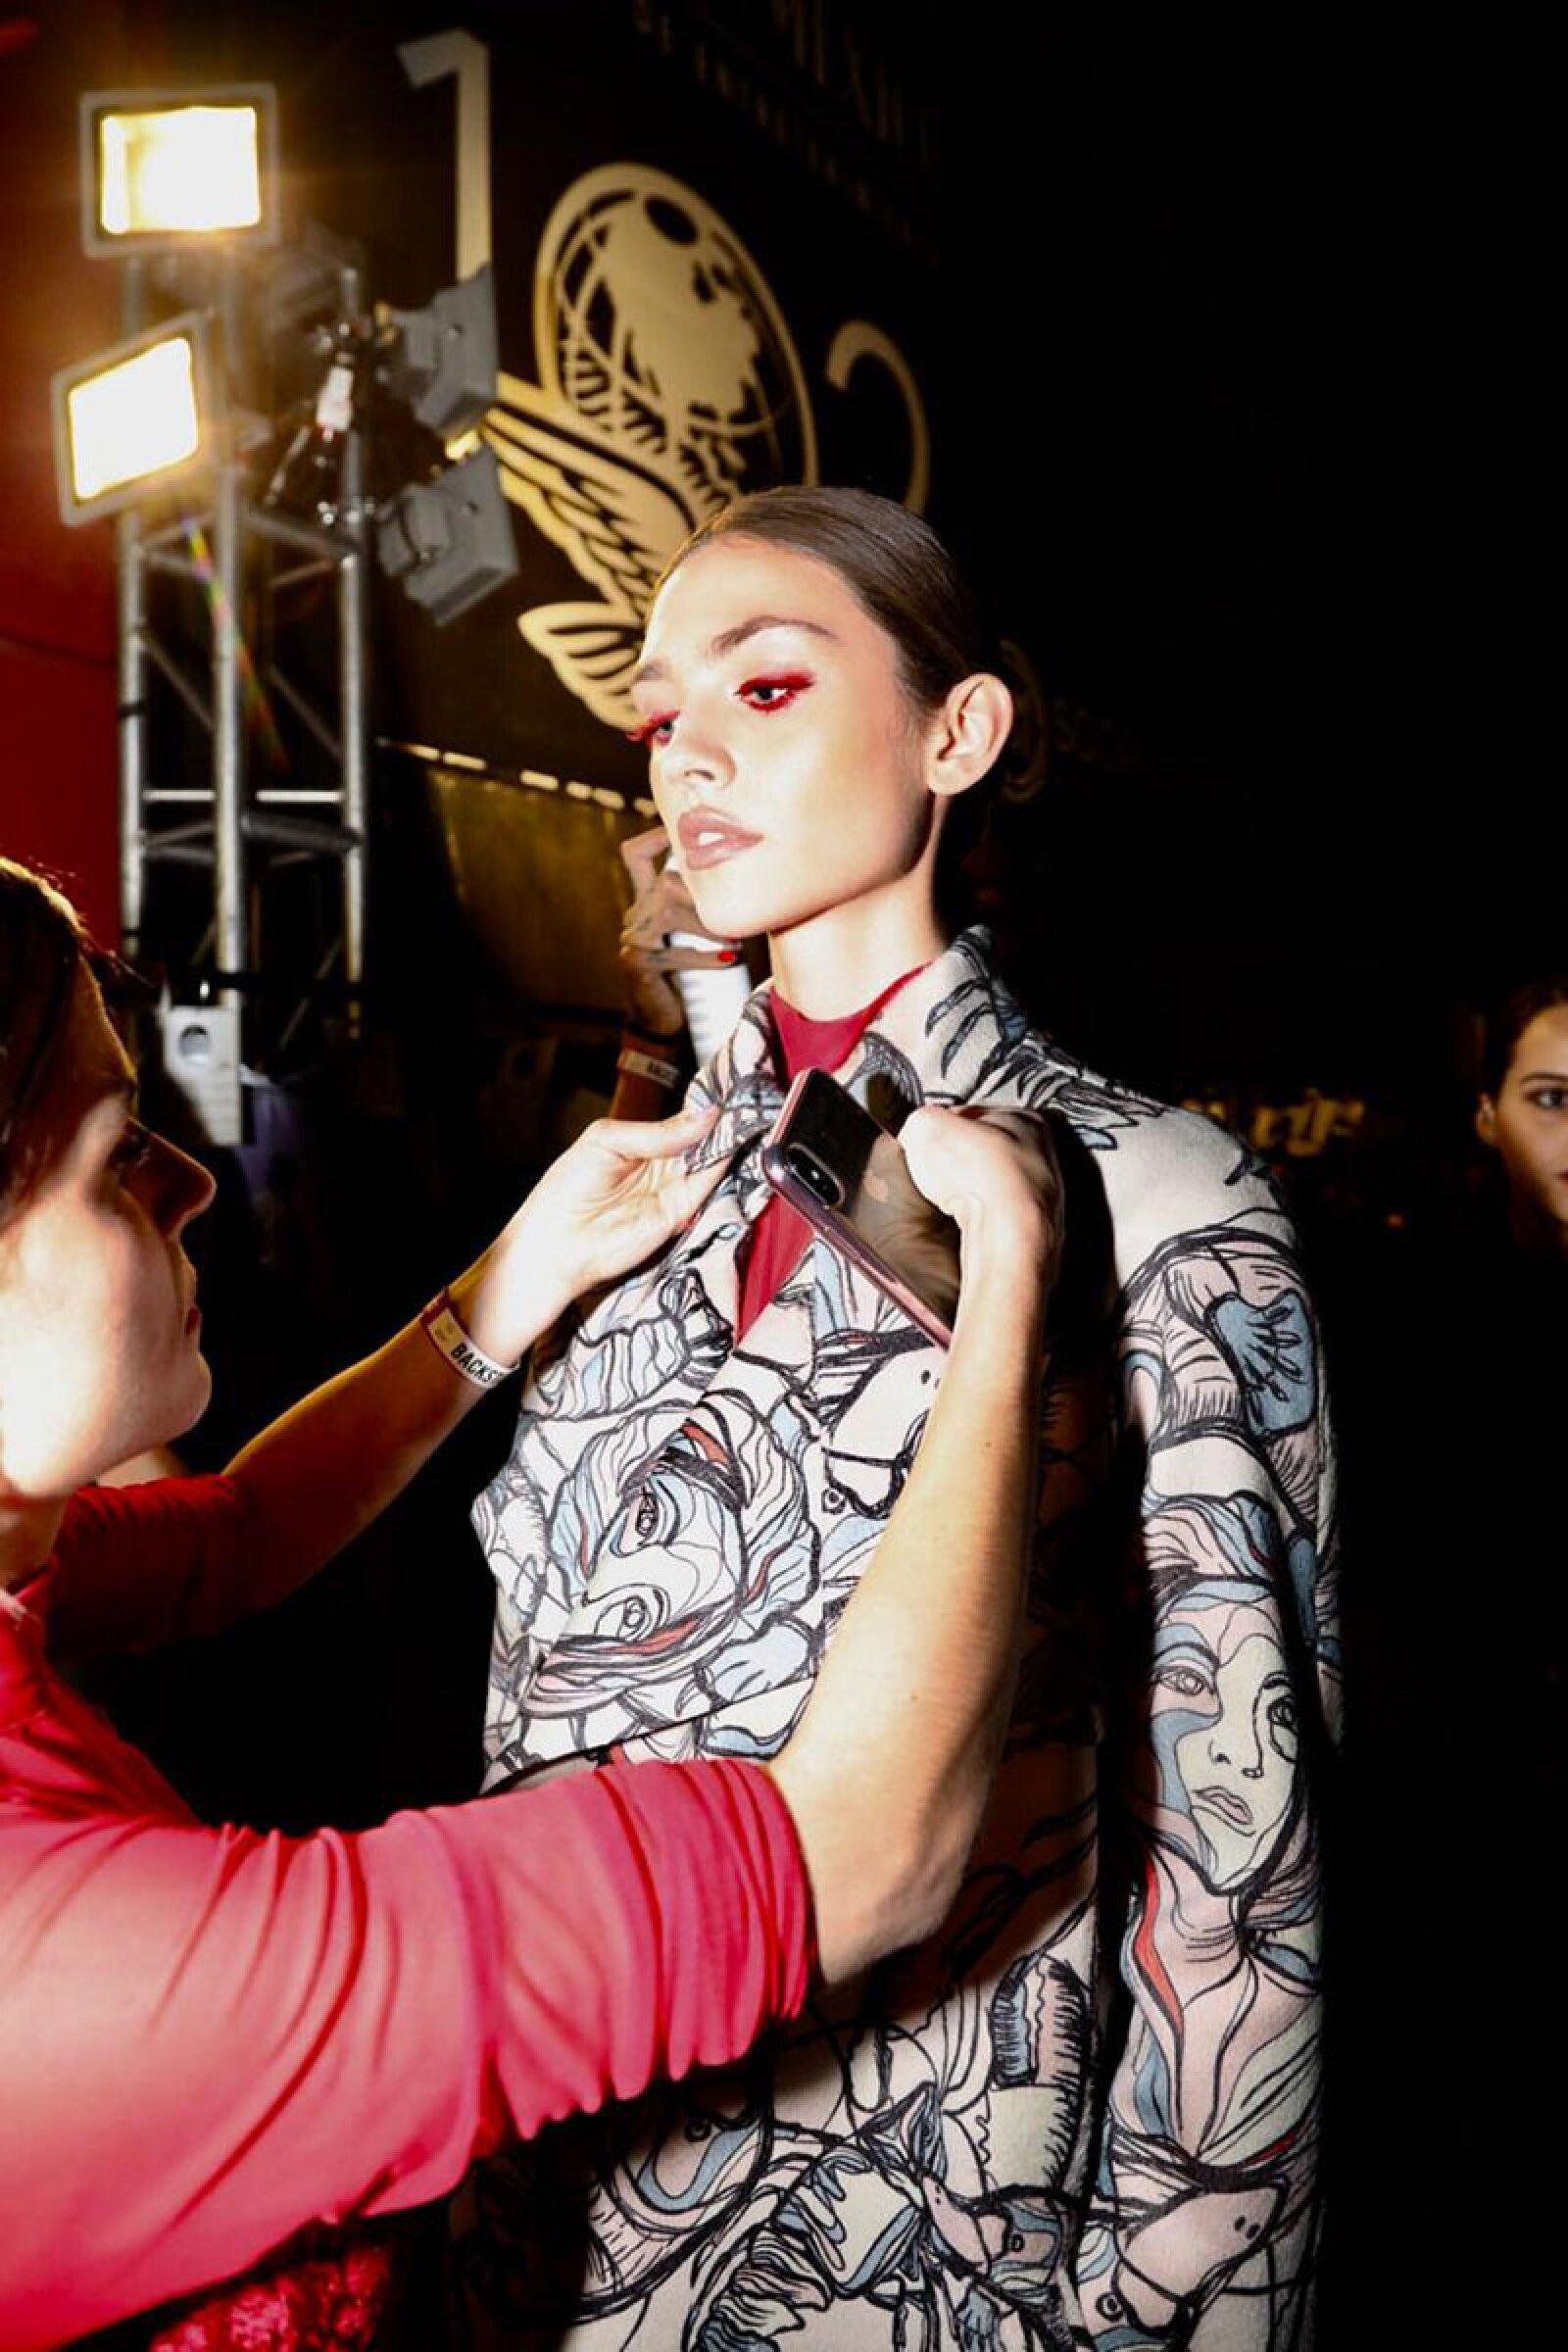 Desfile-Alexia-Ulibarri-MBFWM-Backstage-Model